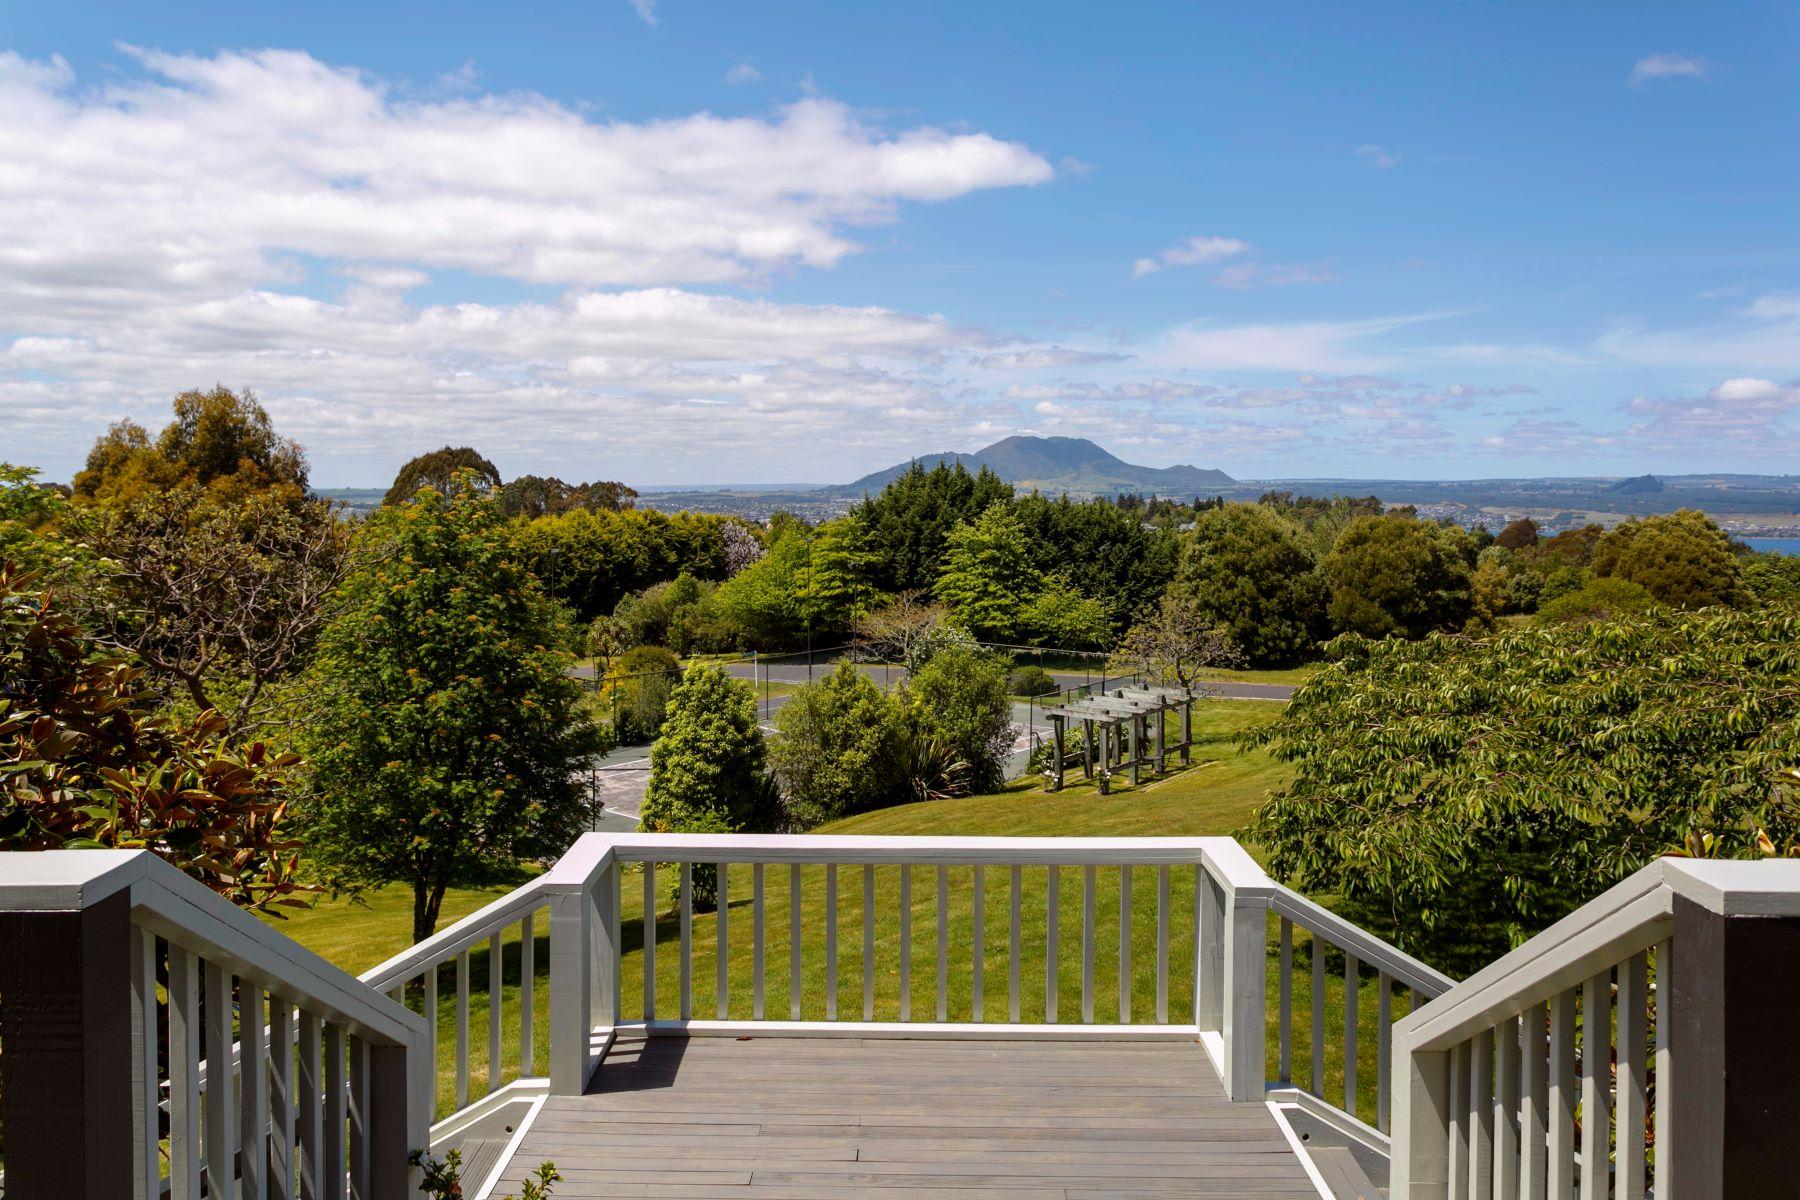 Single Family Homes for Sale at 22 Blue Ridge Drive, Acacia Bay, Taupo Taupo, Waikato New Zealand